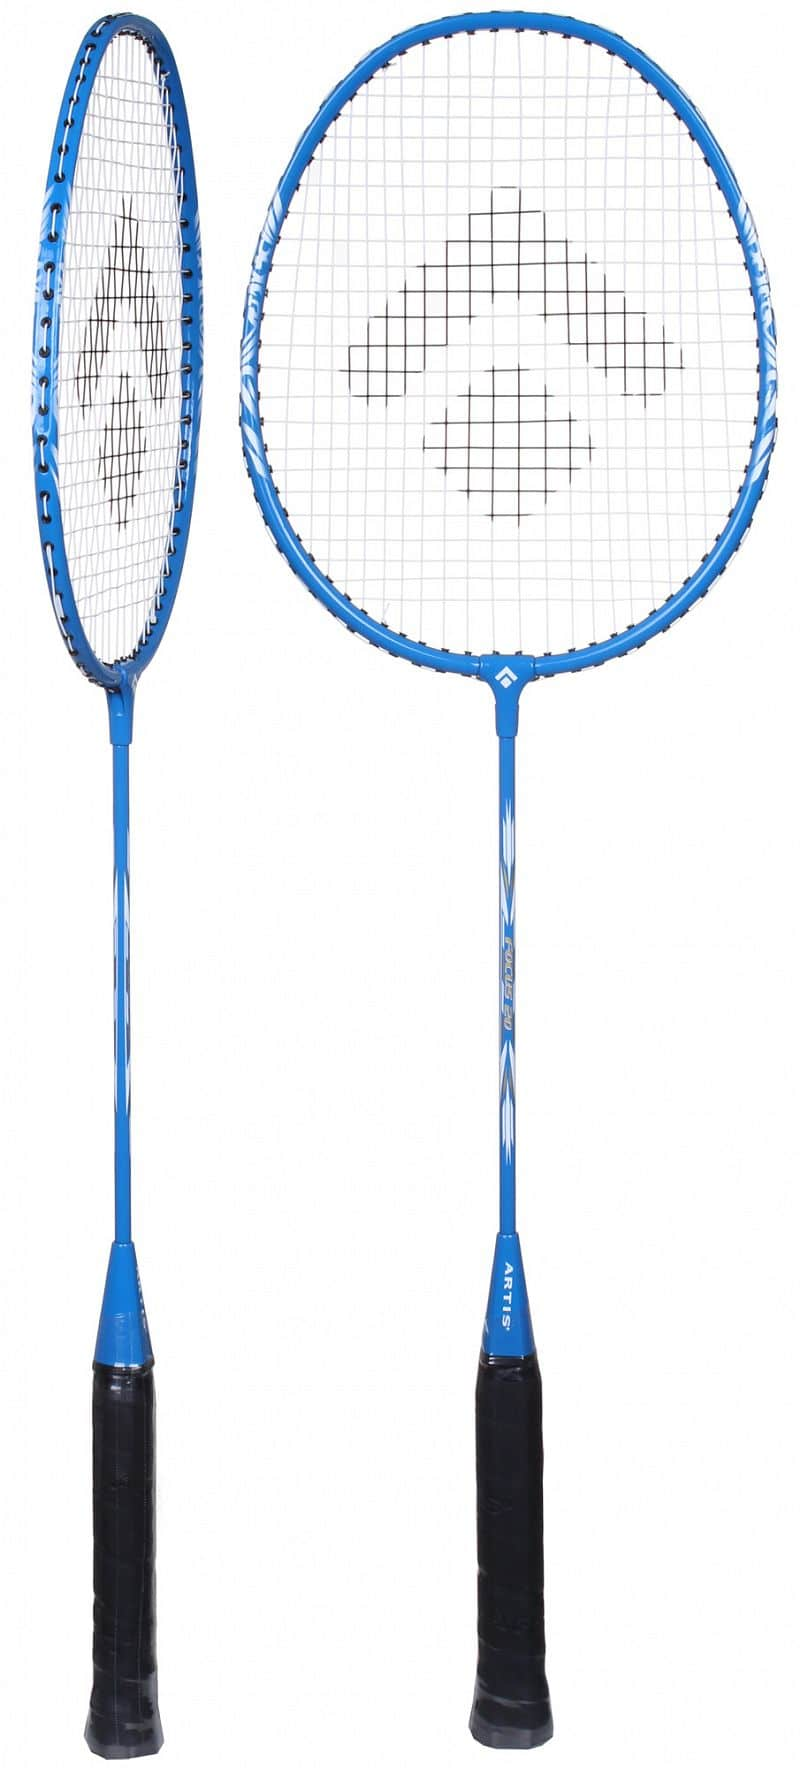 Focus 20 badmintonová raketa